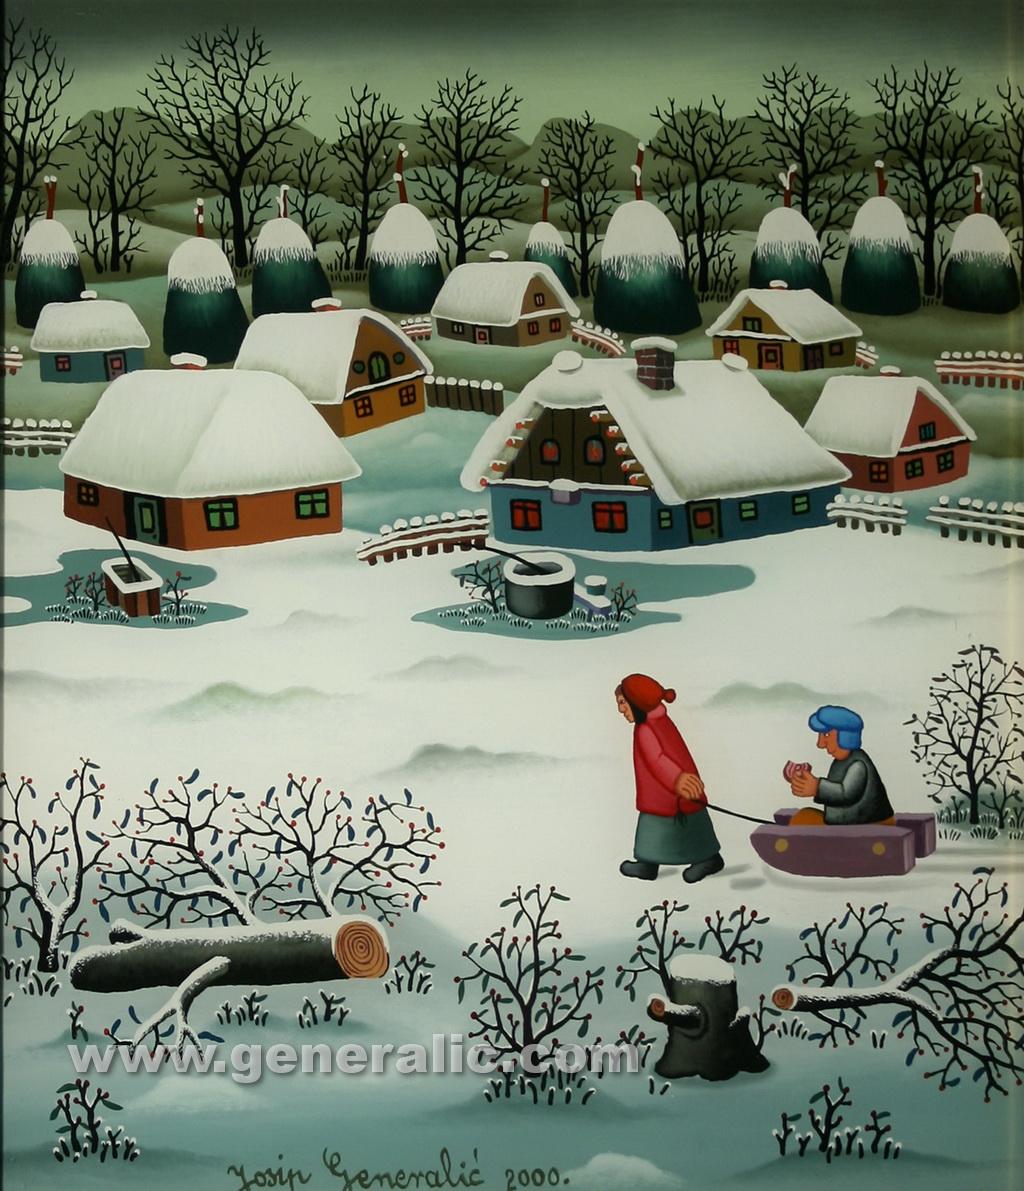 Josip Generalic, 2000, Children with sledge, oil on glass, 40x35 cm